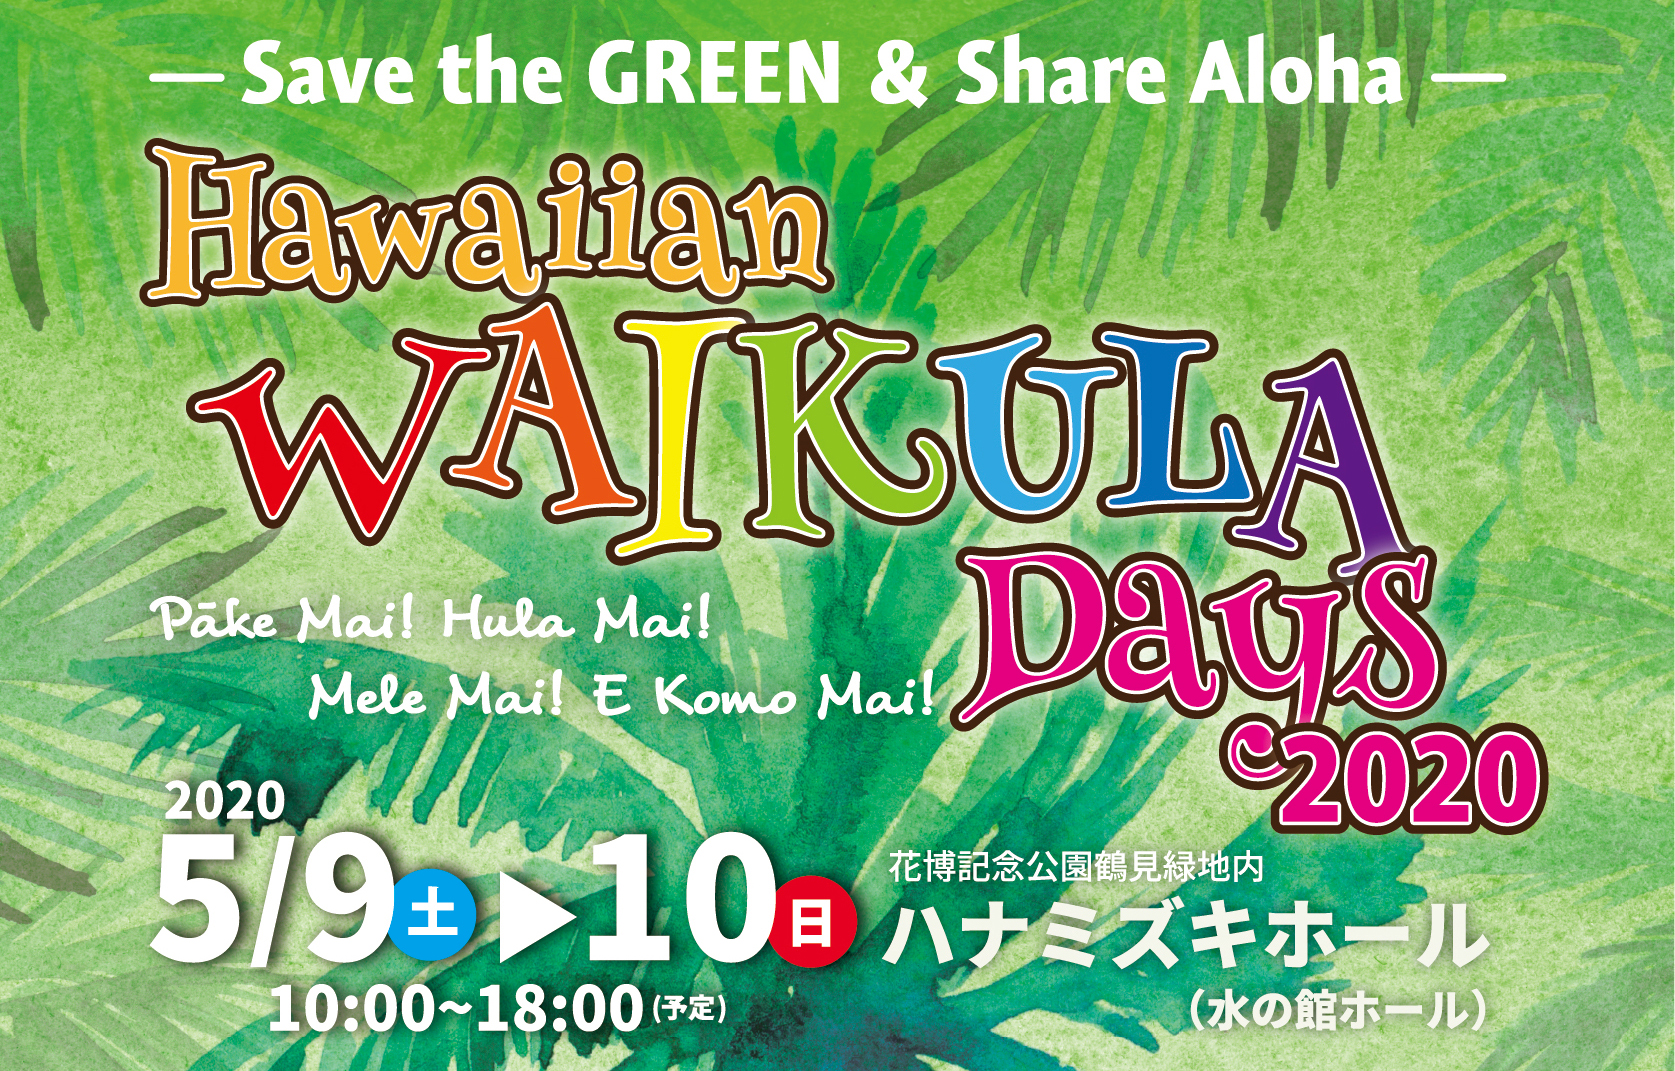 Hawaiian WAI KULA Days 2020開催決定!